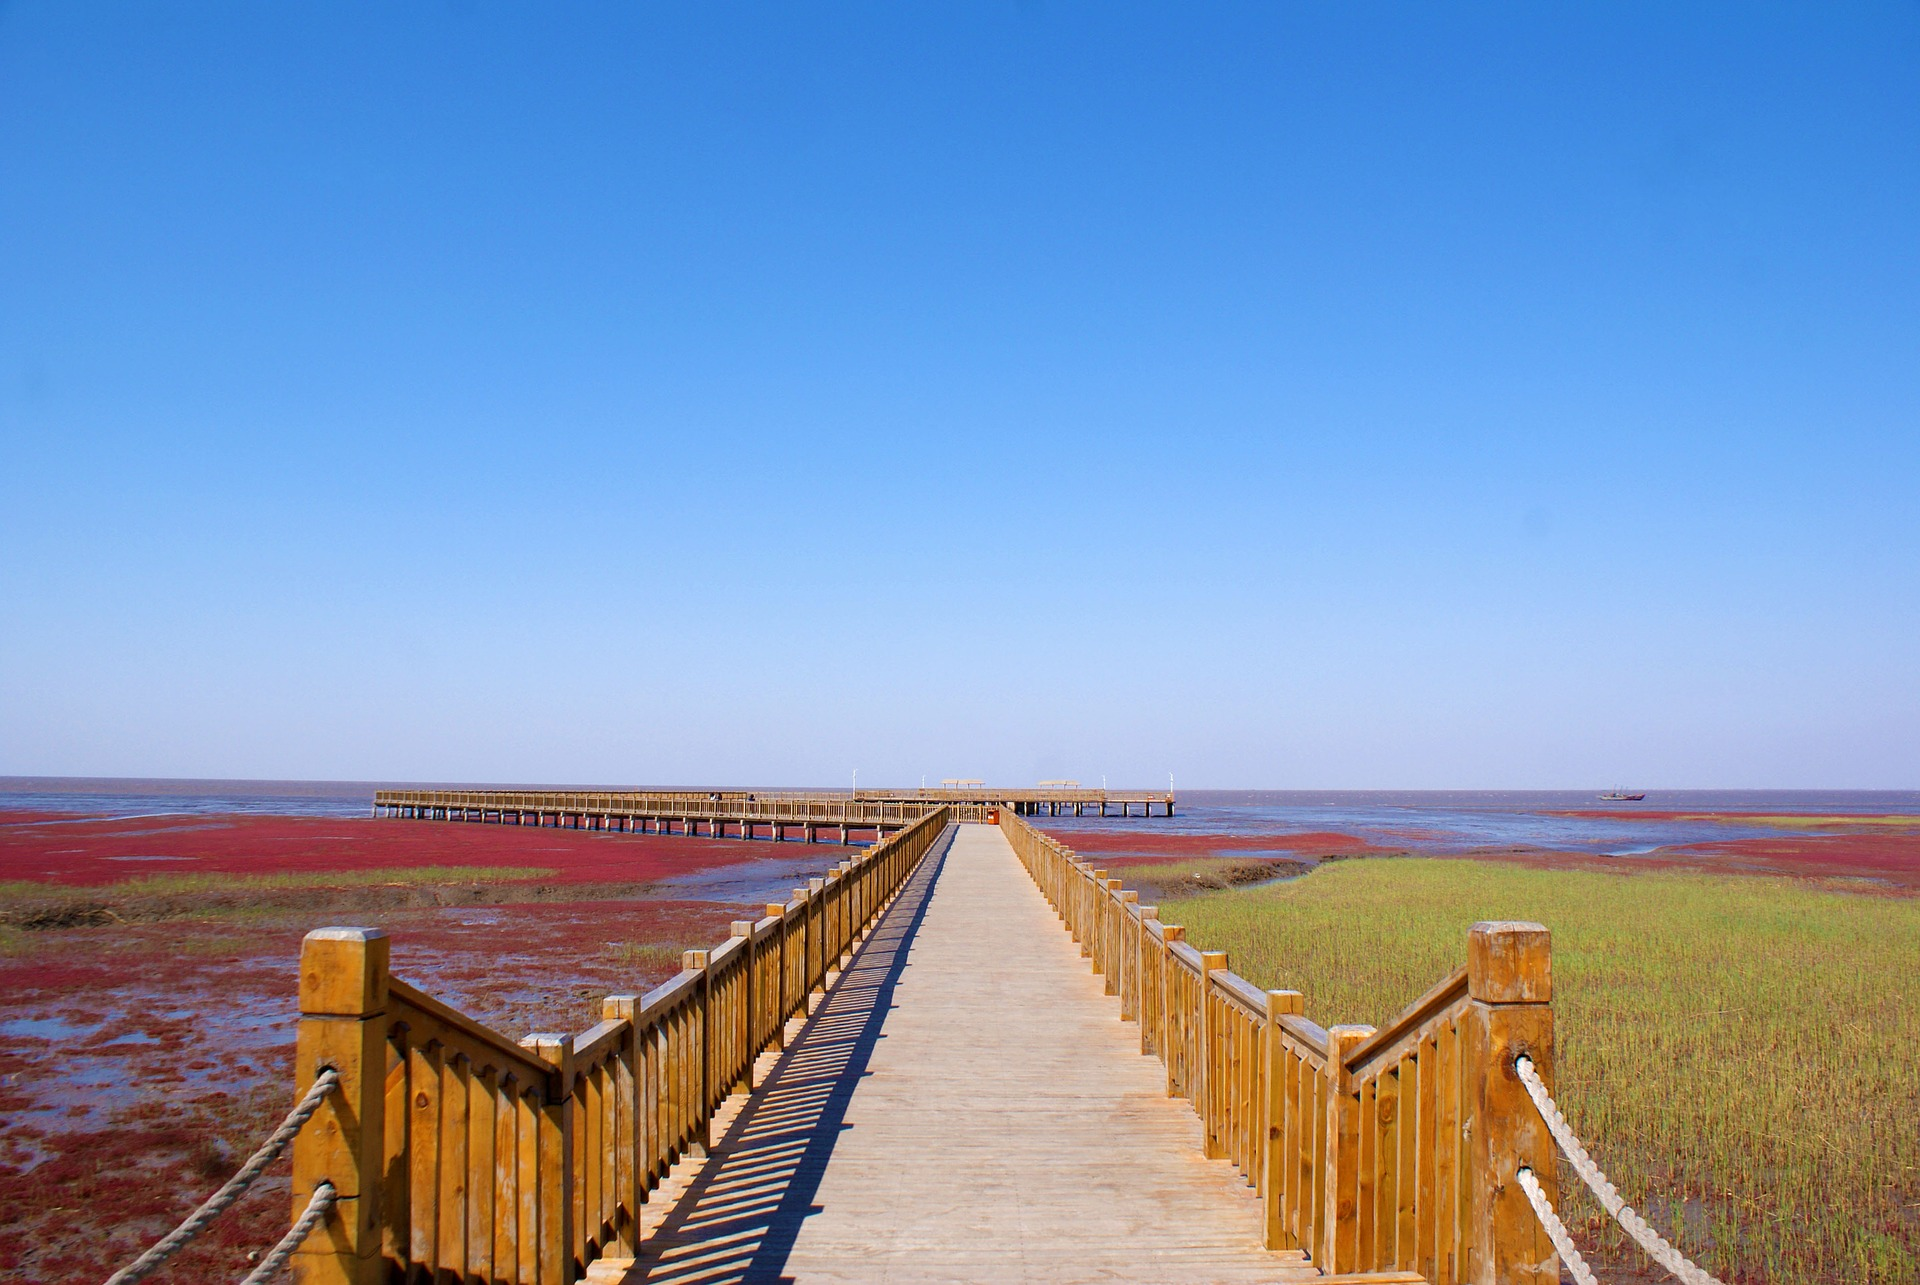 Panjin die Stadt mit dem roten Strand in China Pauschal ab 729,84€